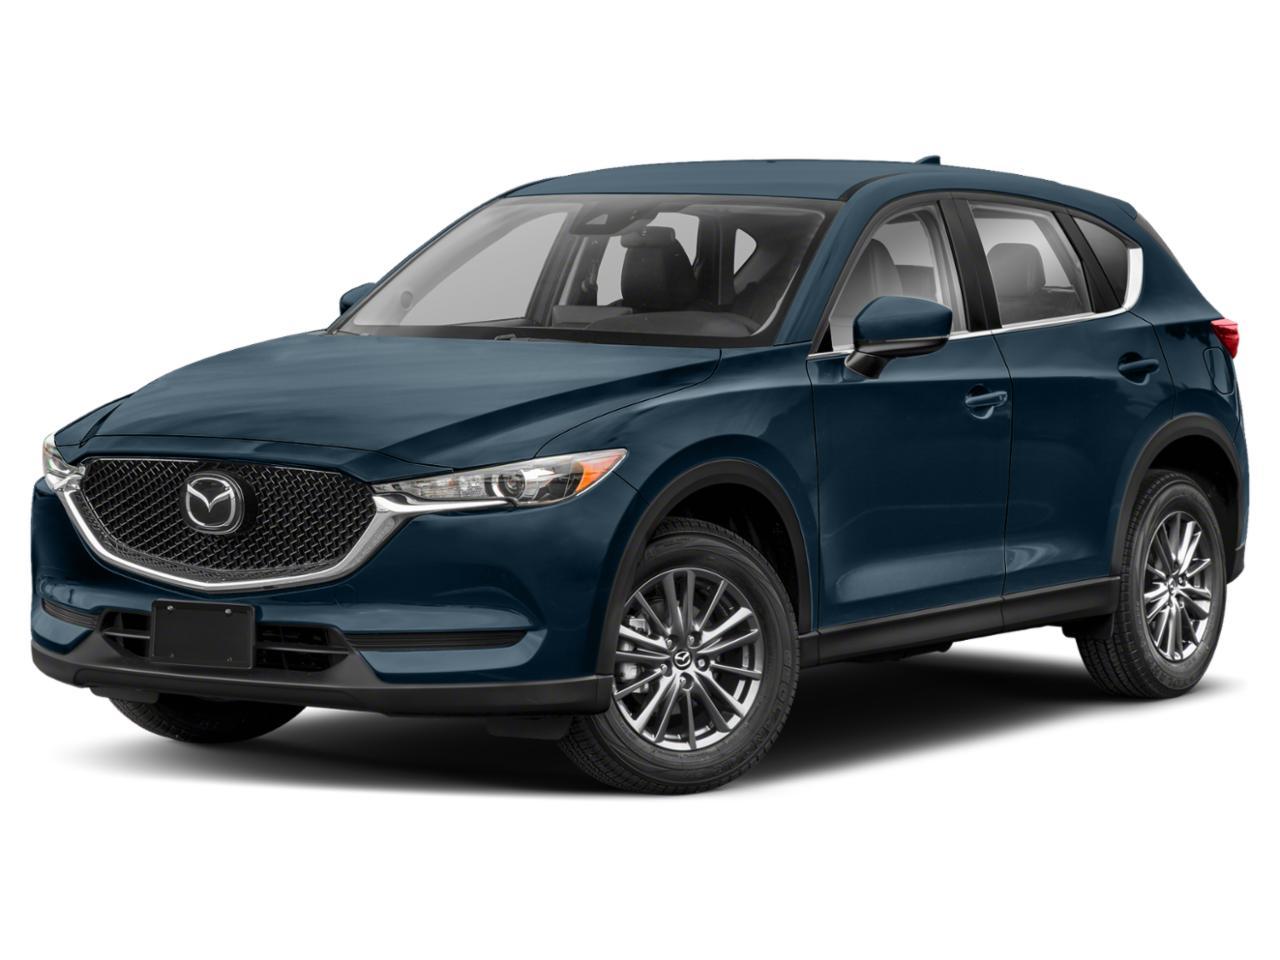 2021 Mazda CX-5 Vehicle Photo in Green Bay, WI 54304